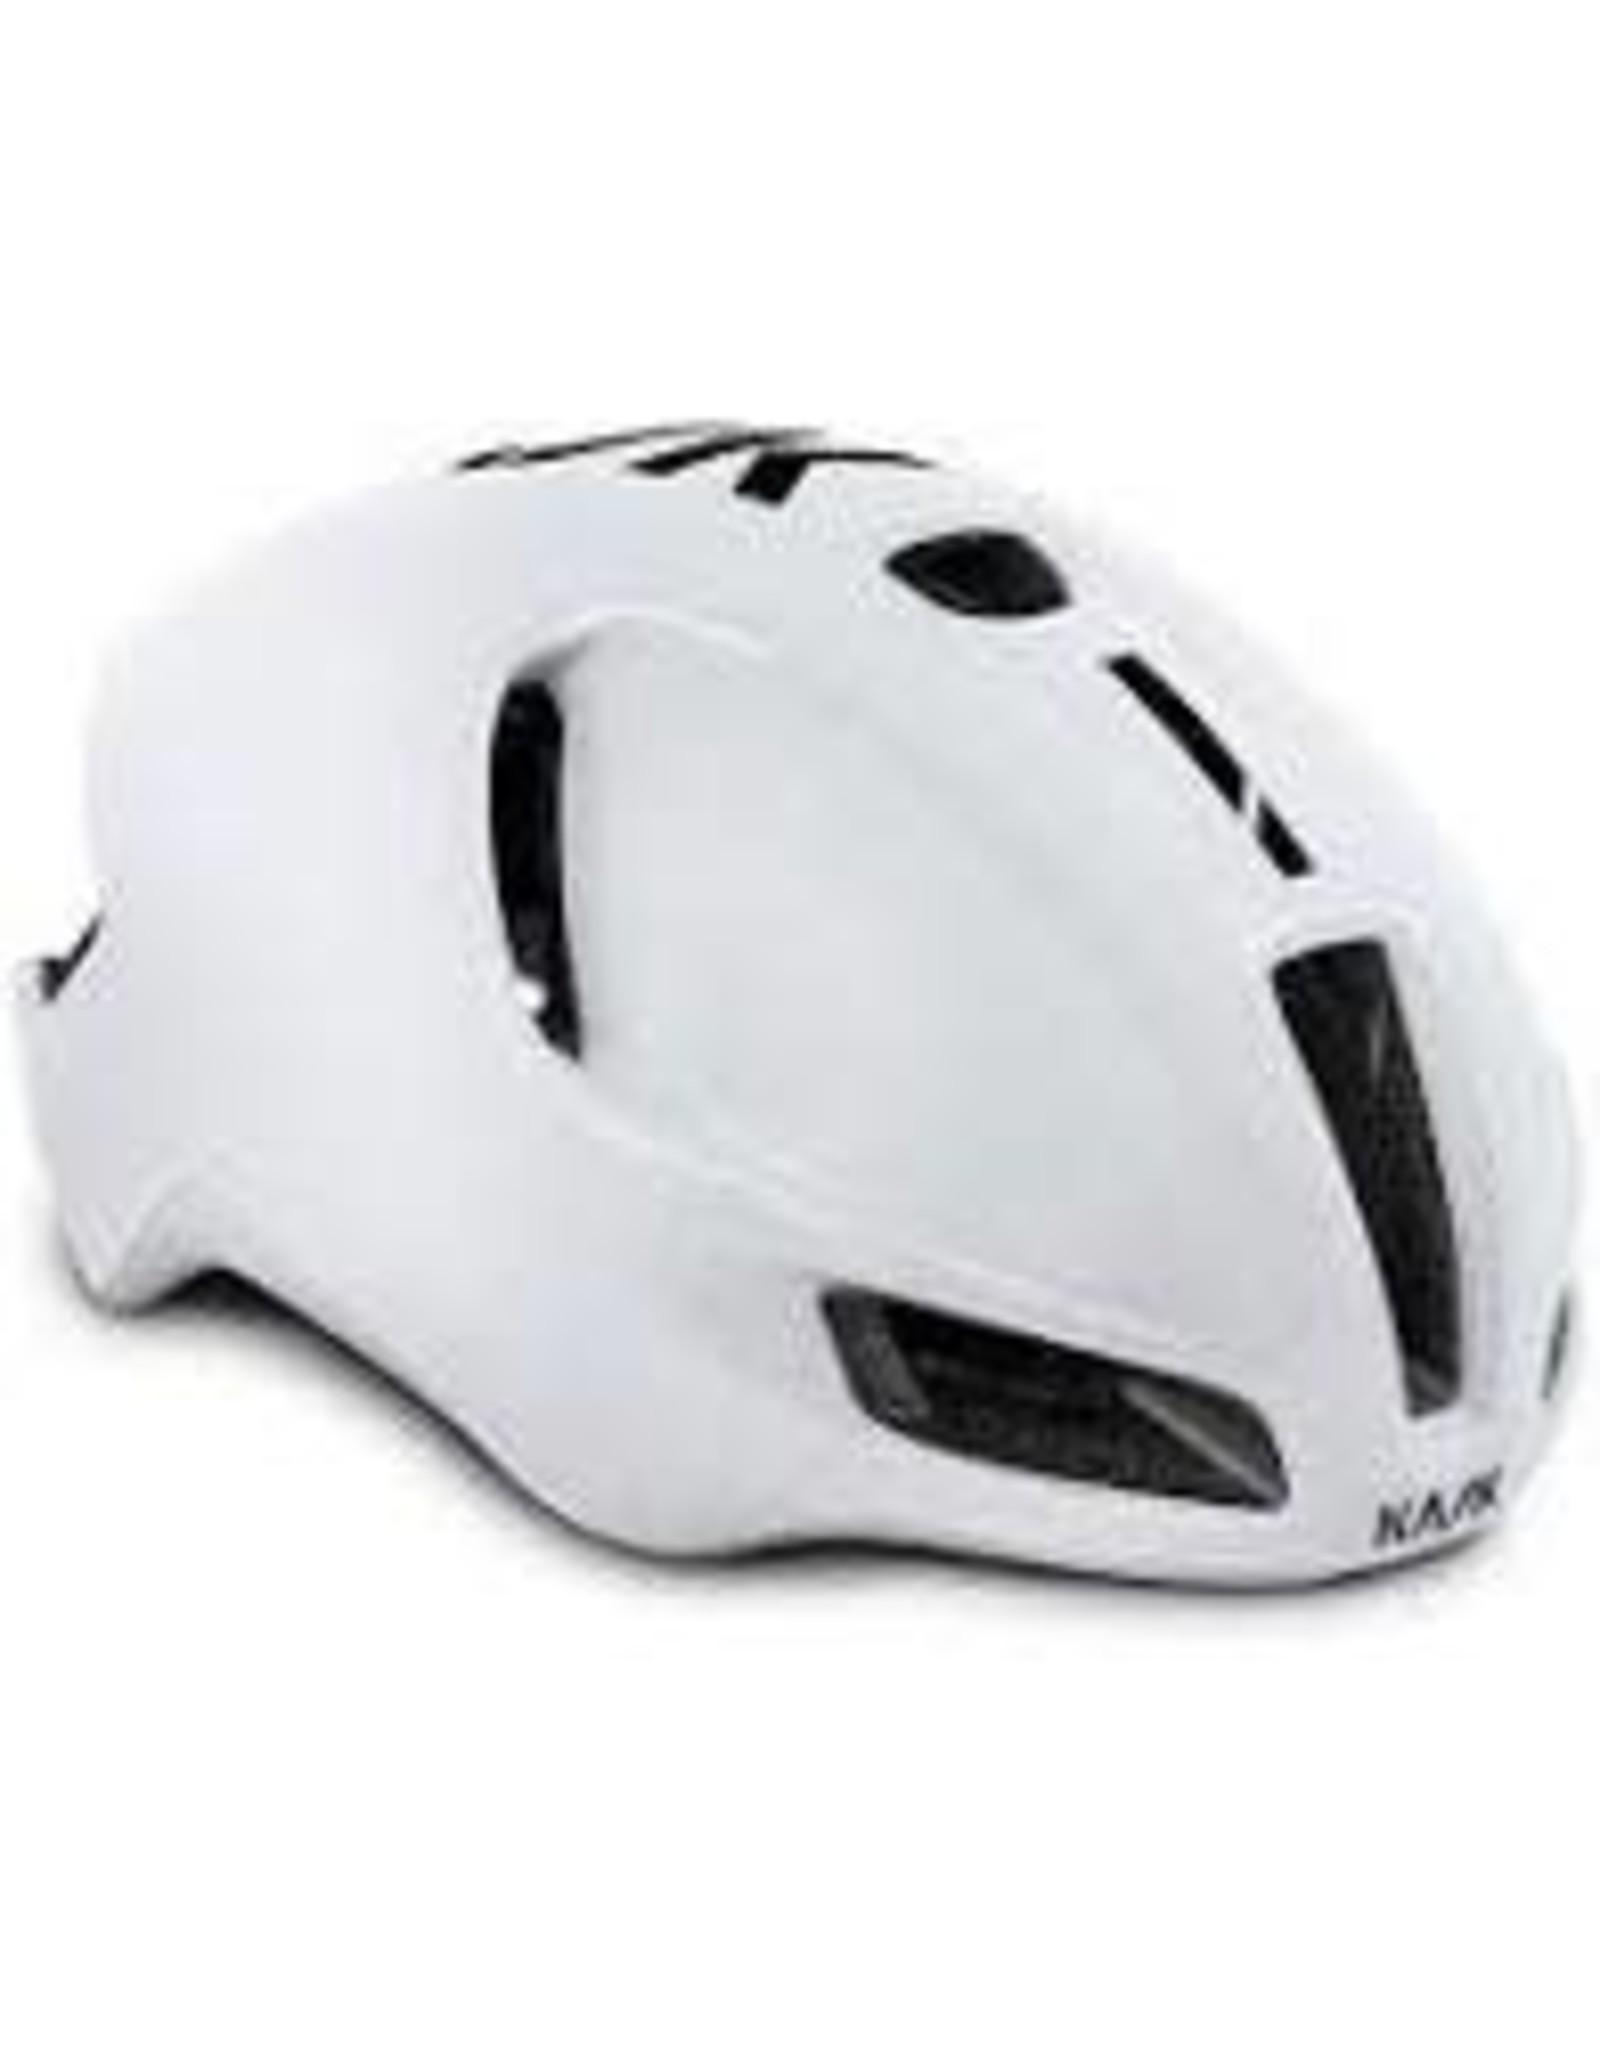 Kask 20', KASK, Utopia, Helmet